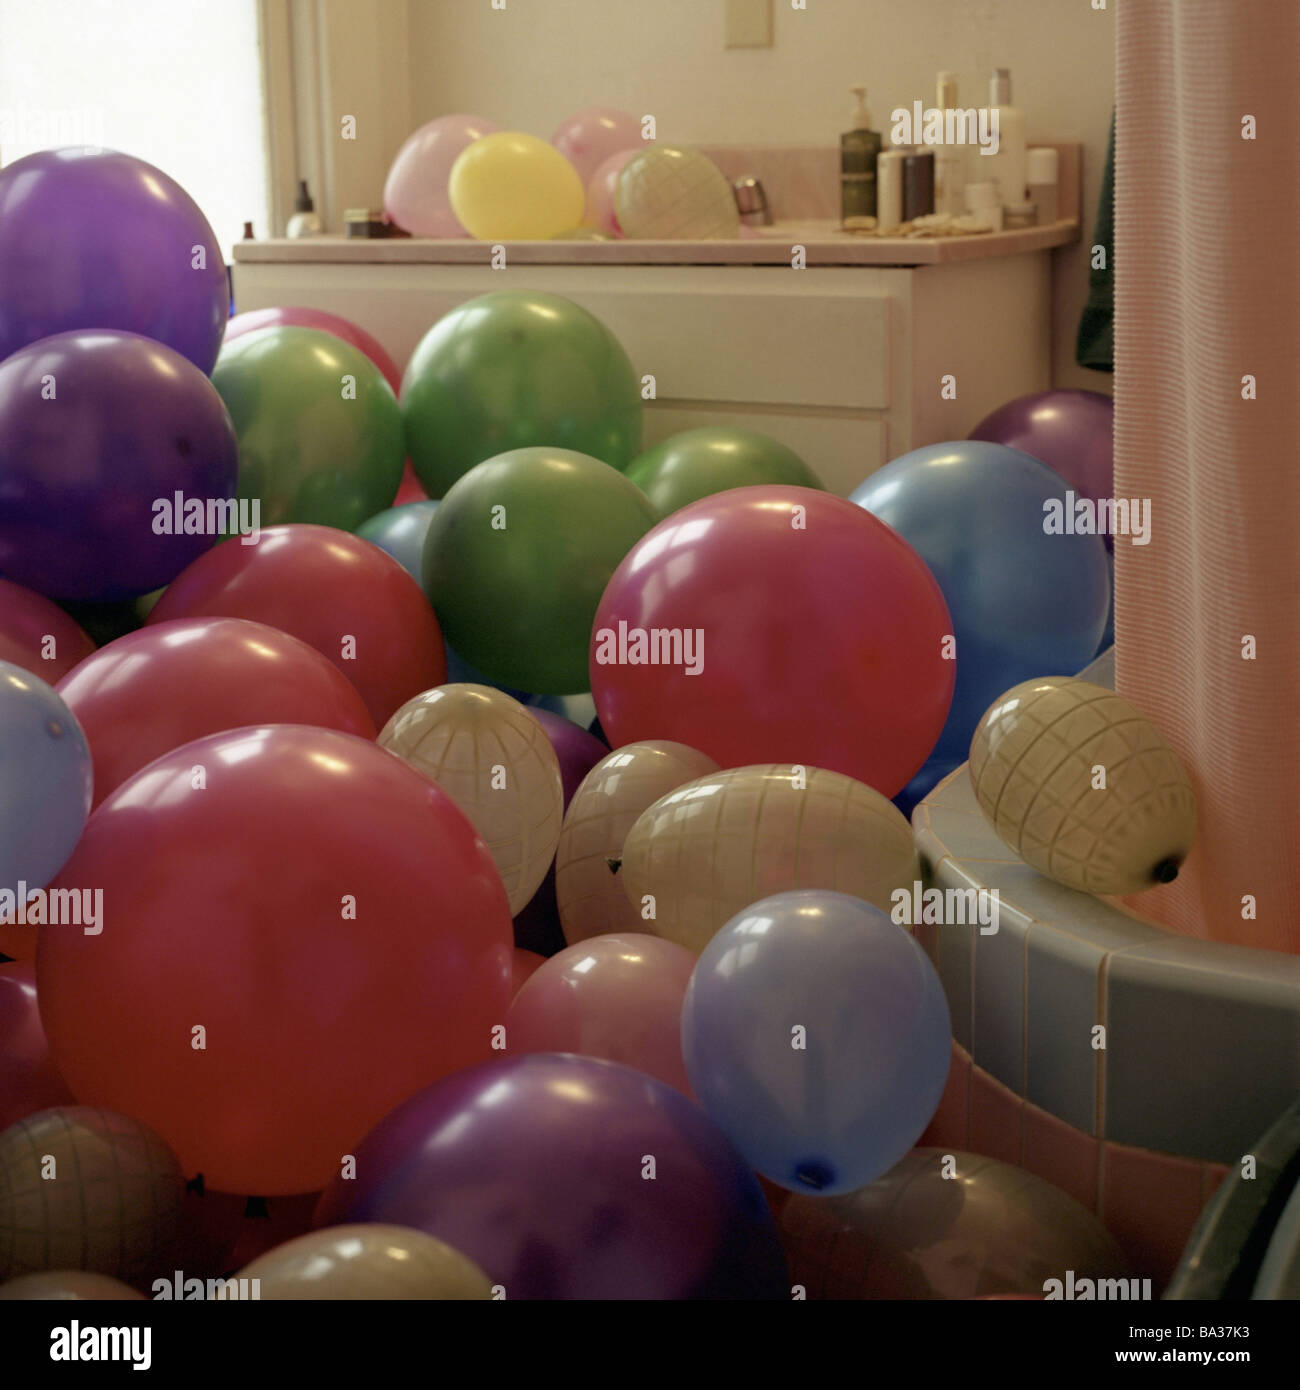 Bathroom balloons prank joke humor overfills cleverly surprise wedding wedding-prank bath balloons inflated colorfully - Stock Image